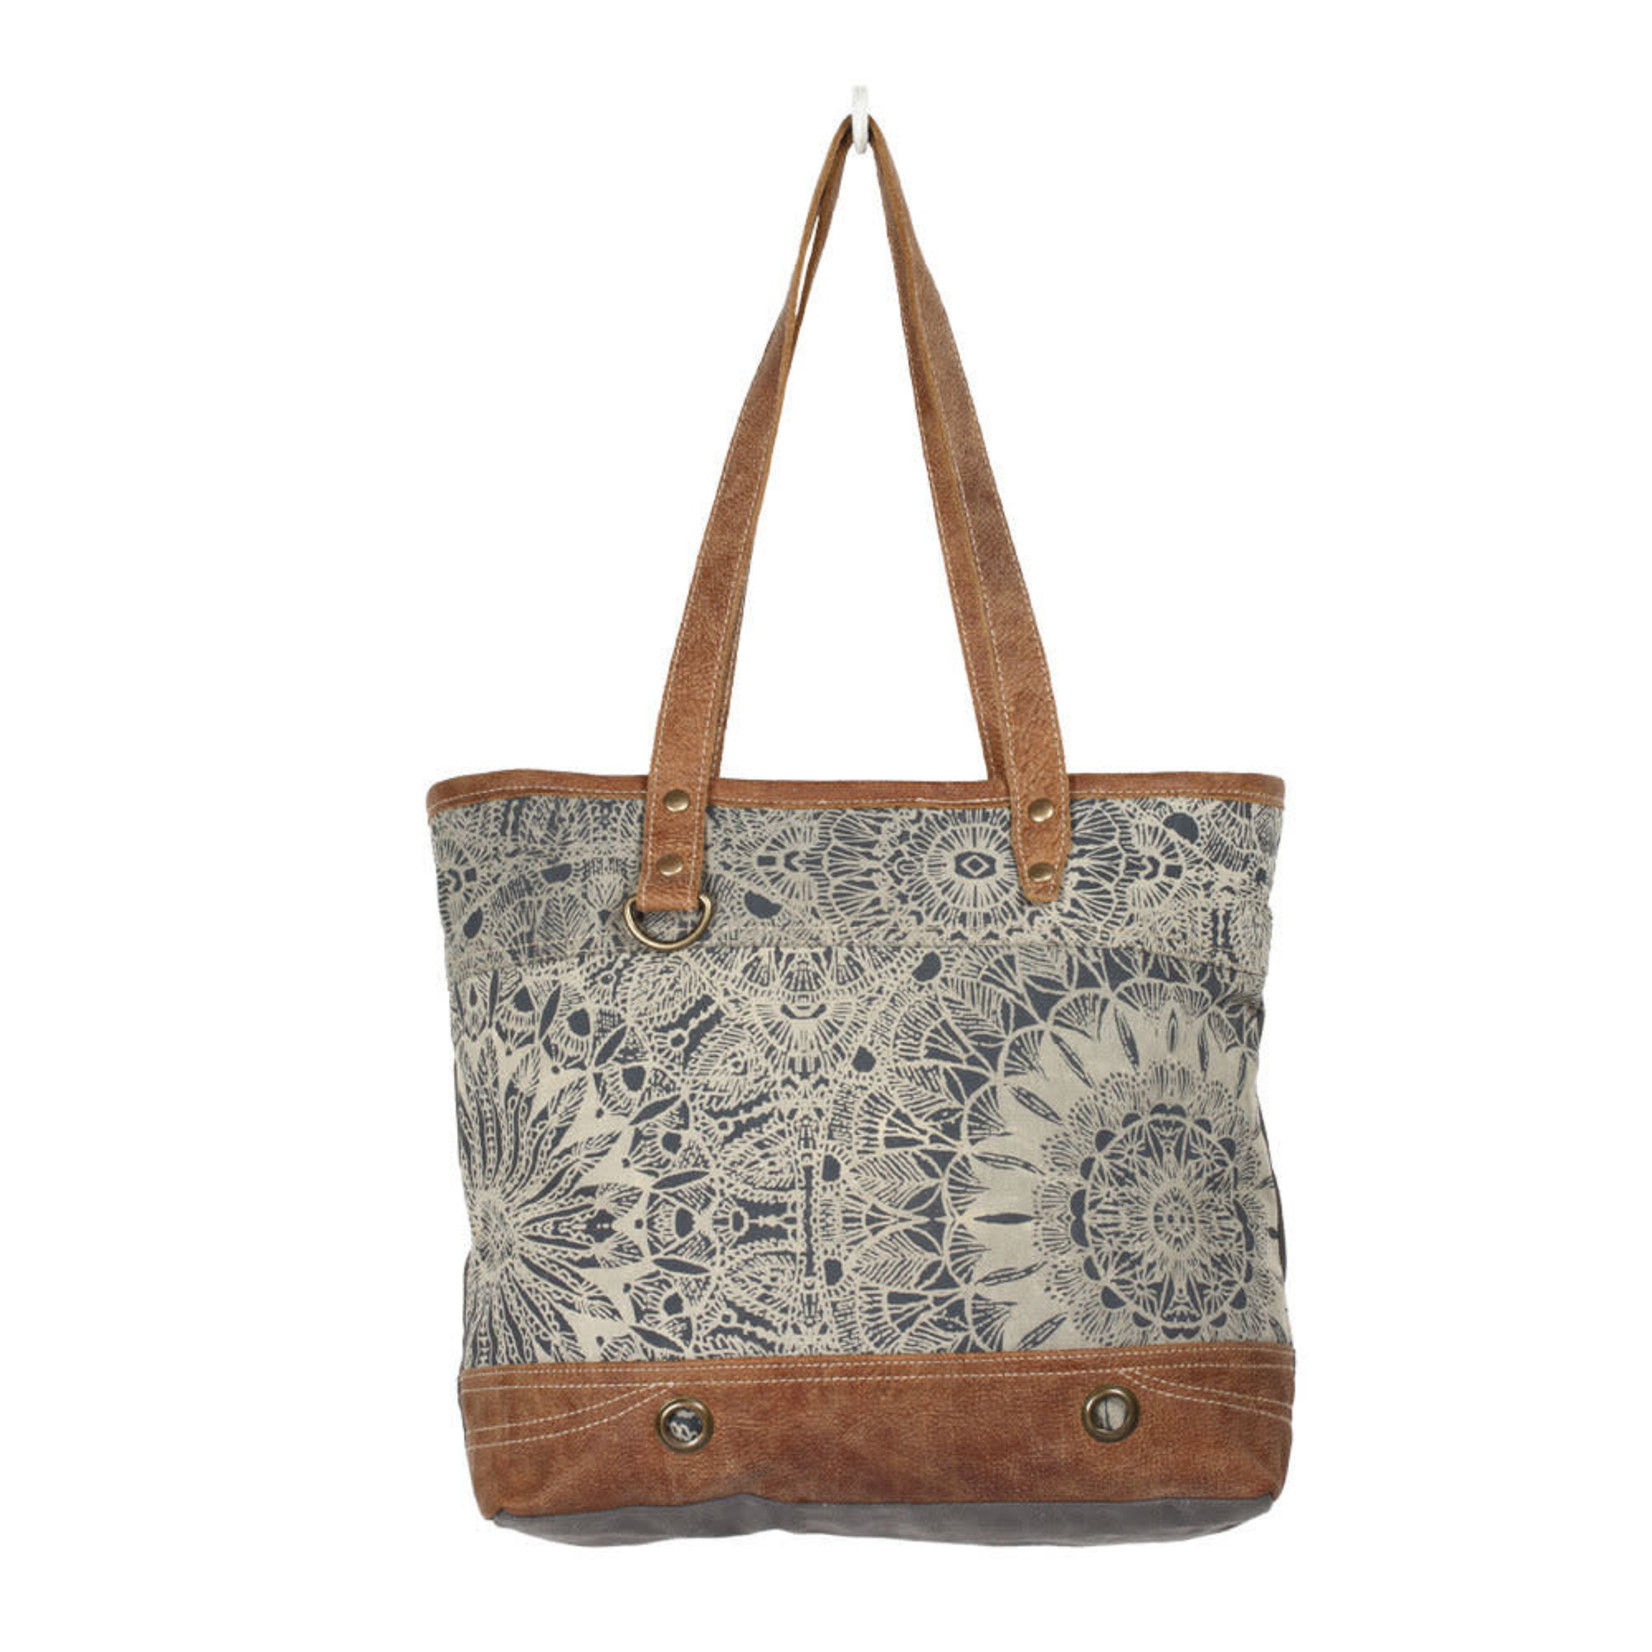 Myra Bags S-1385 Objet D'Art Leather Tote Bag